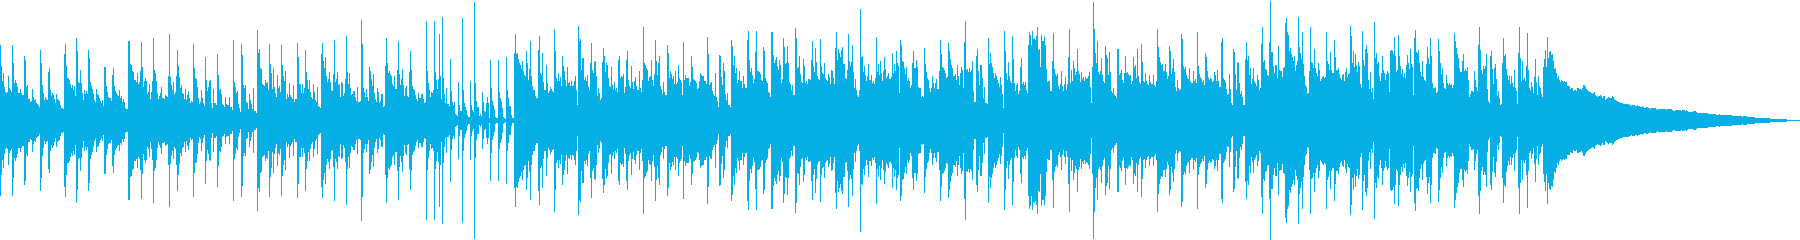 AuspiciousDay 60秒メロ無の再生済みの波形